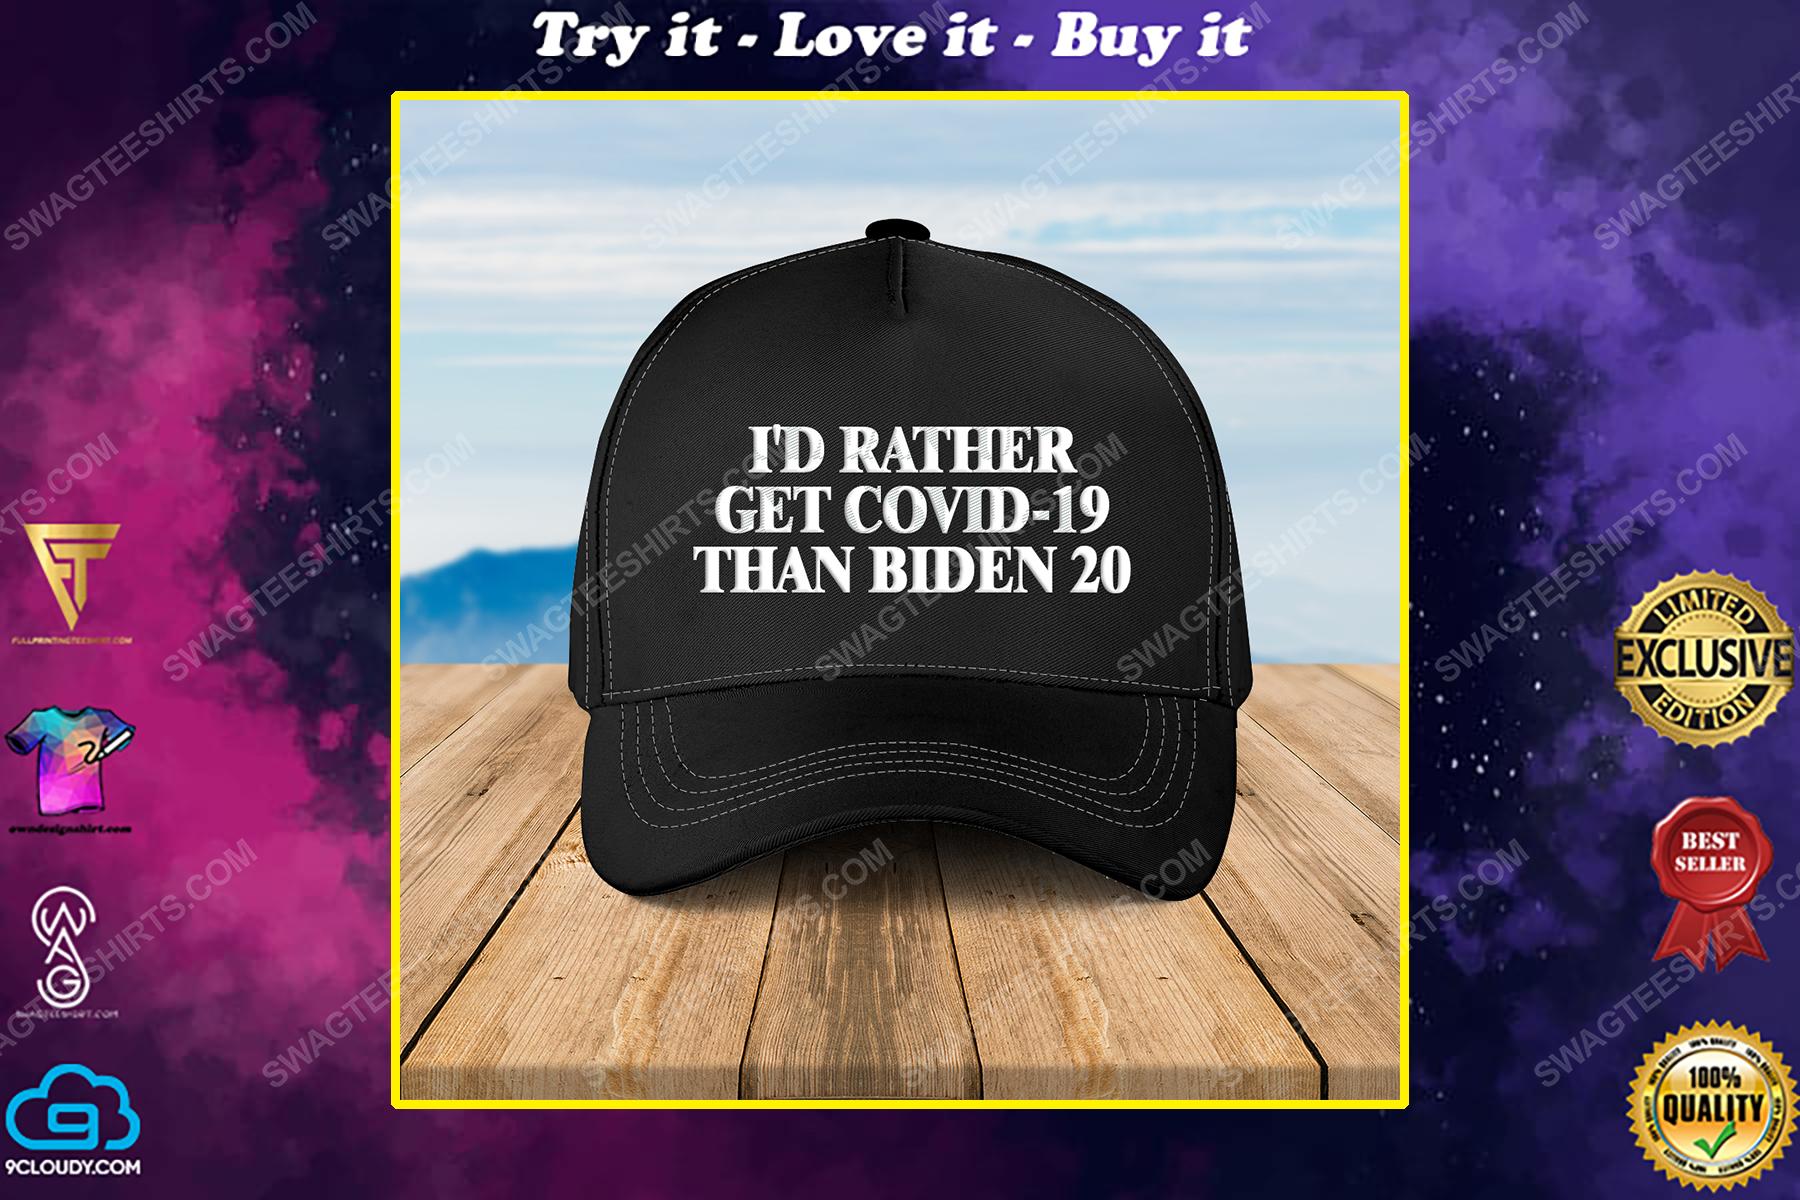 I'd rather get covid-19 than biden 20 full print classic hat